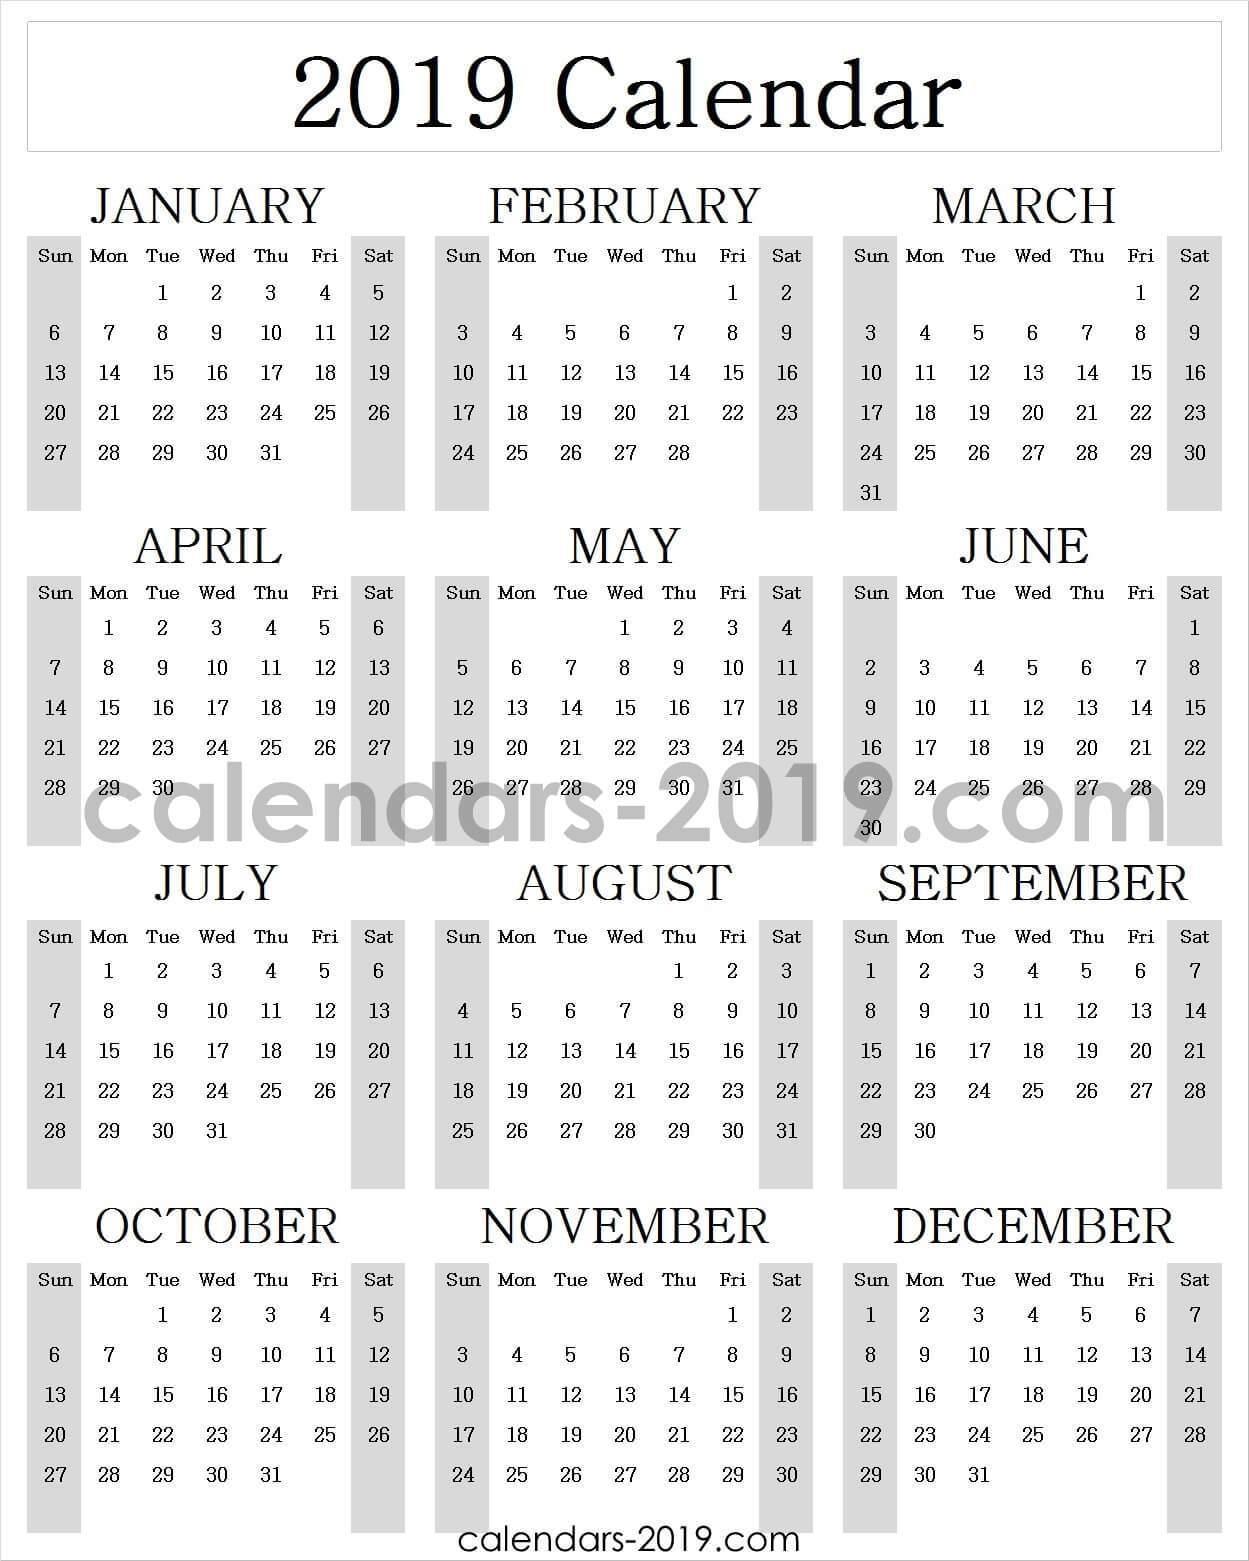 Calendar 2019 Archives.